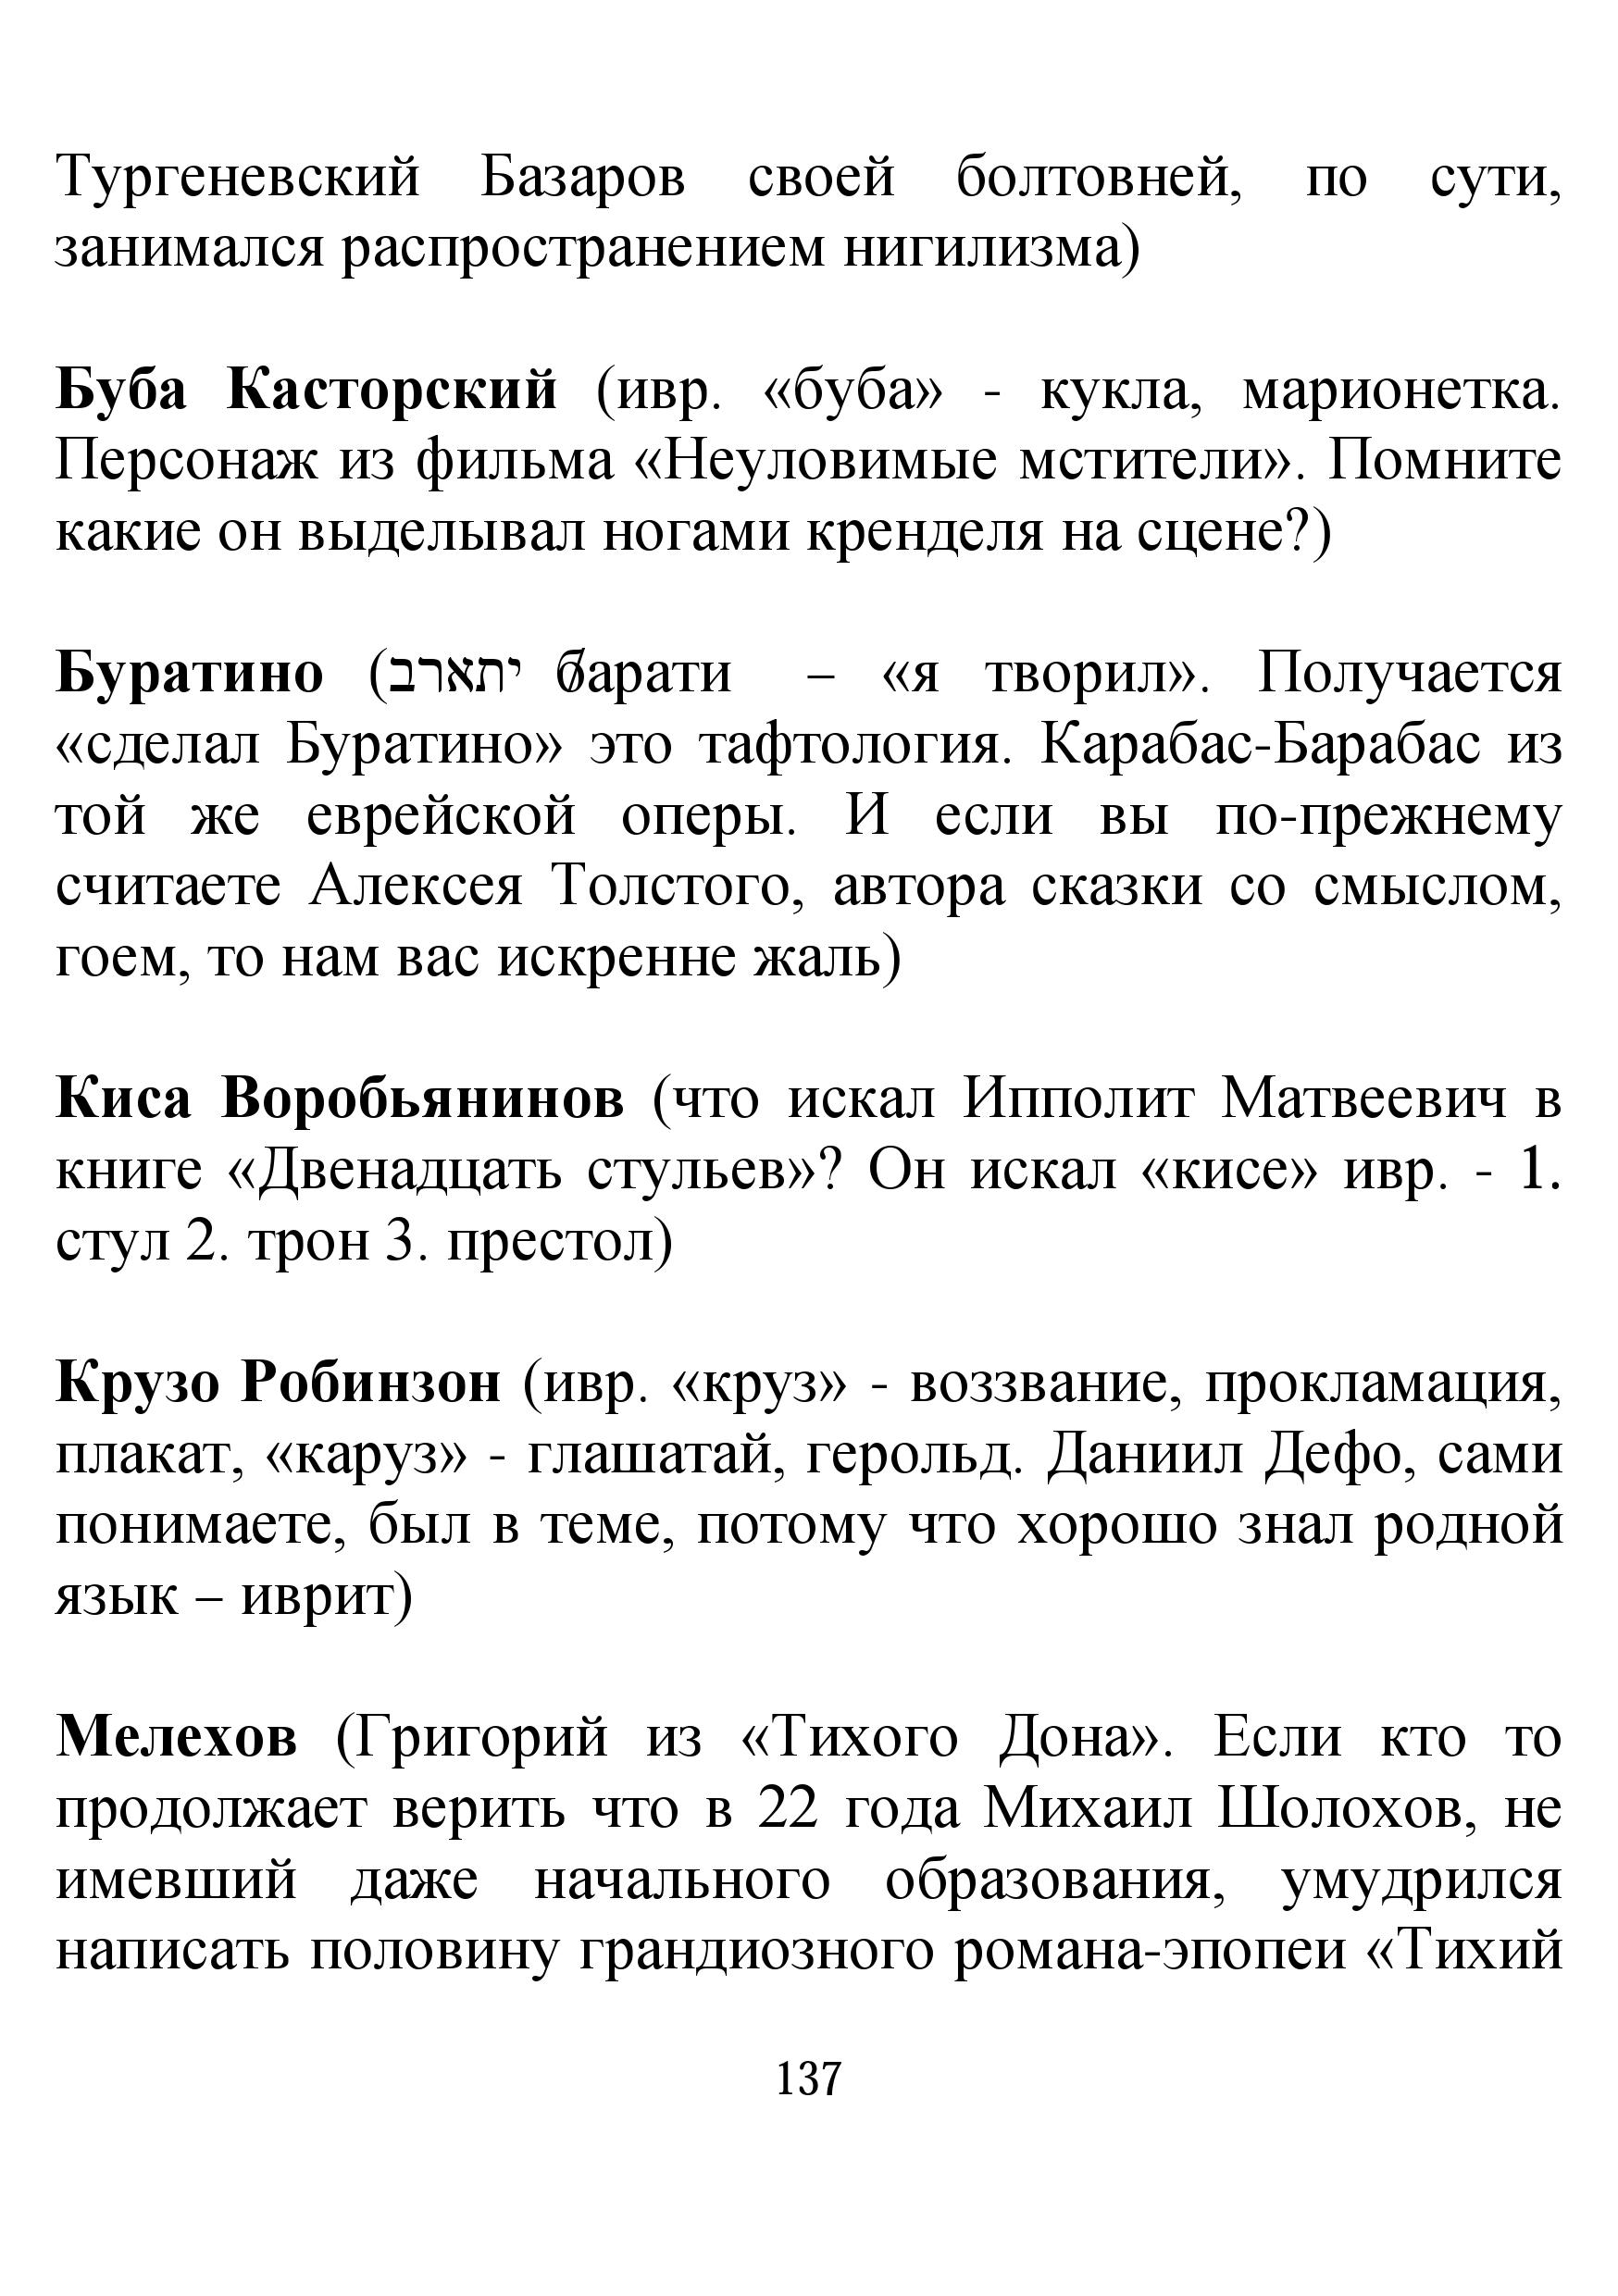 http://s1.uploads.ru/SbwBz.jpg